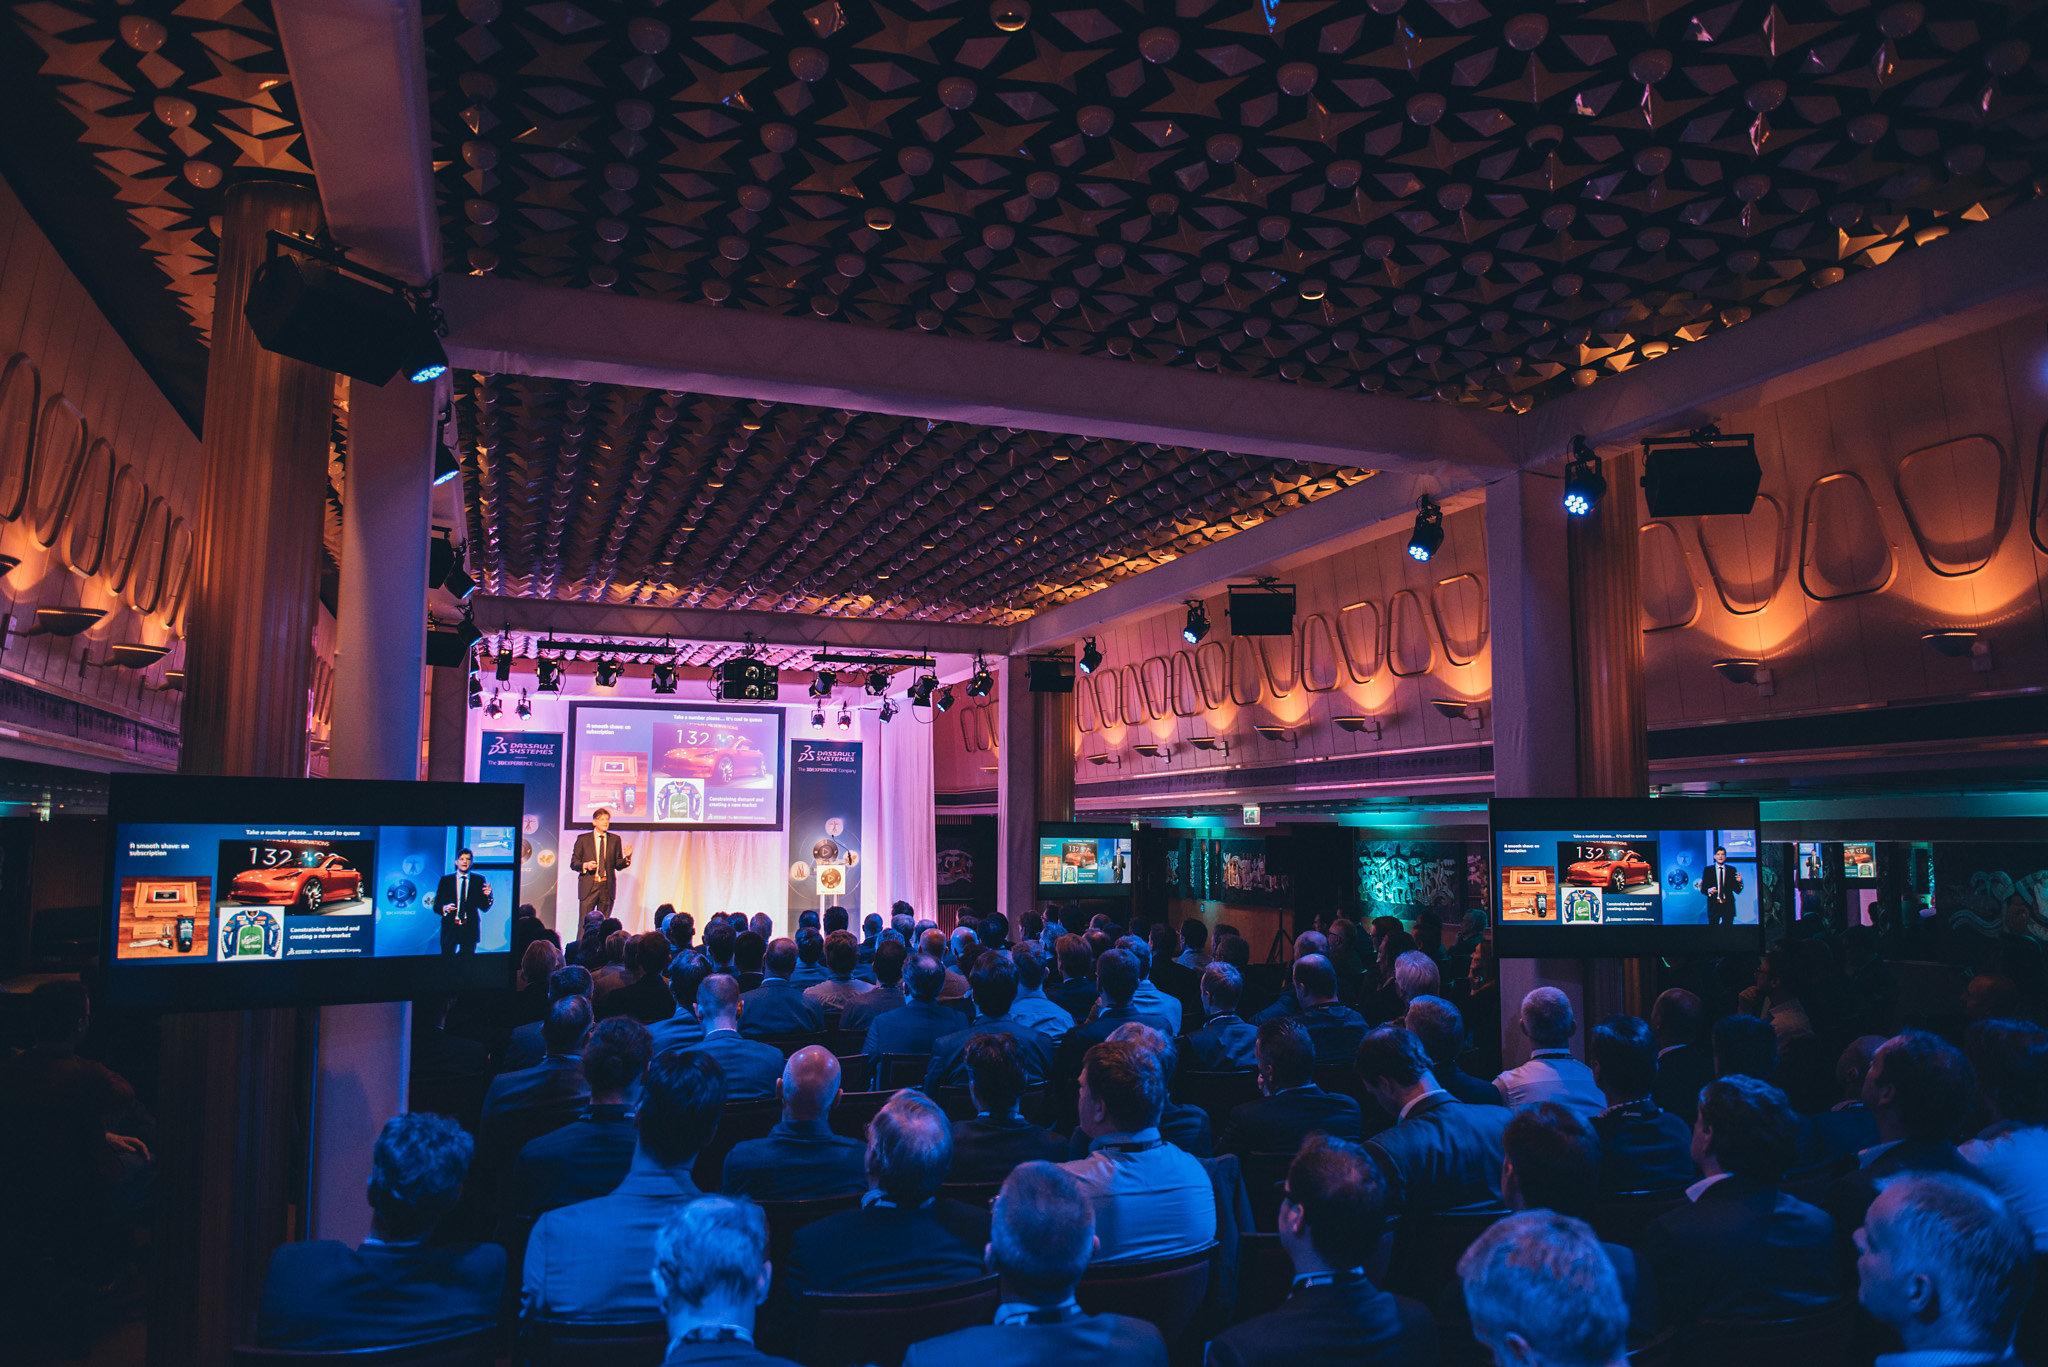 3DX_forum_event_highlights_rotterdam_presentations-20.jpg